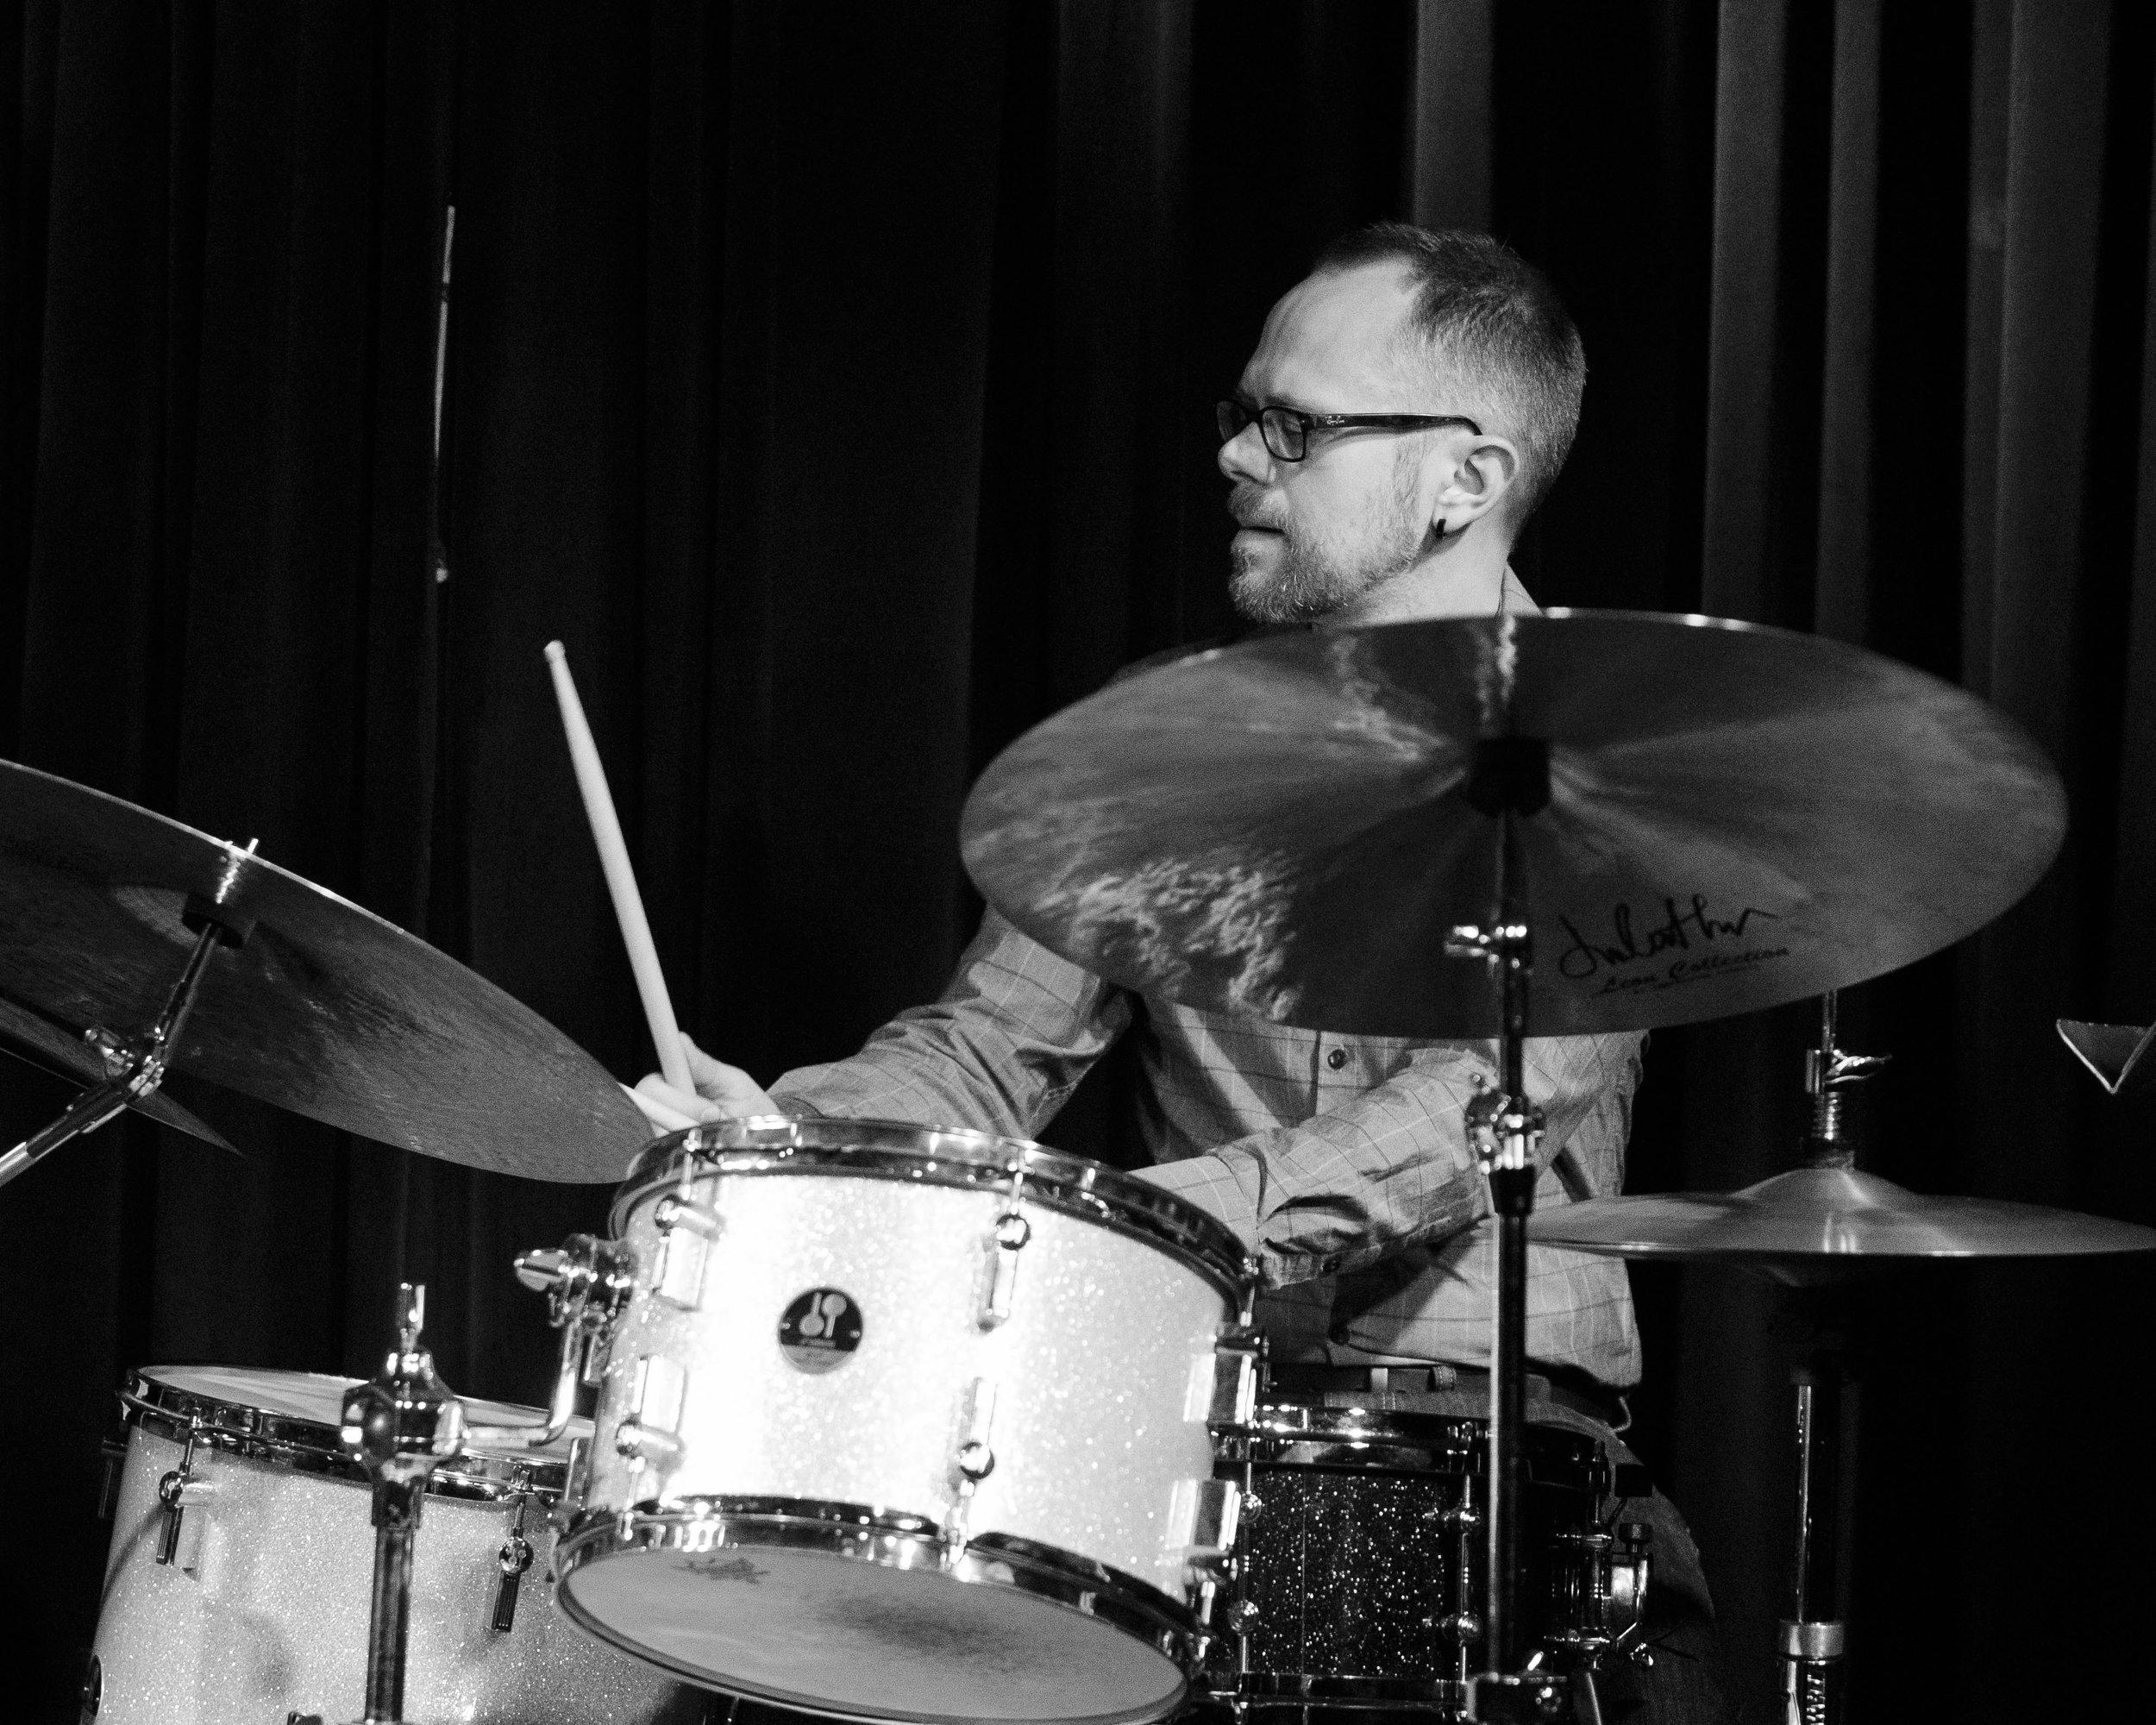 Union 32 playing Scandinavian Jazz at The Nash Jazz Club